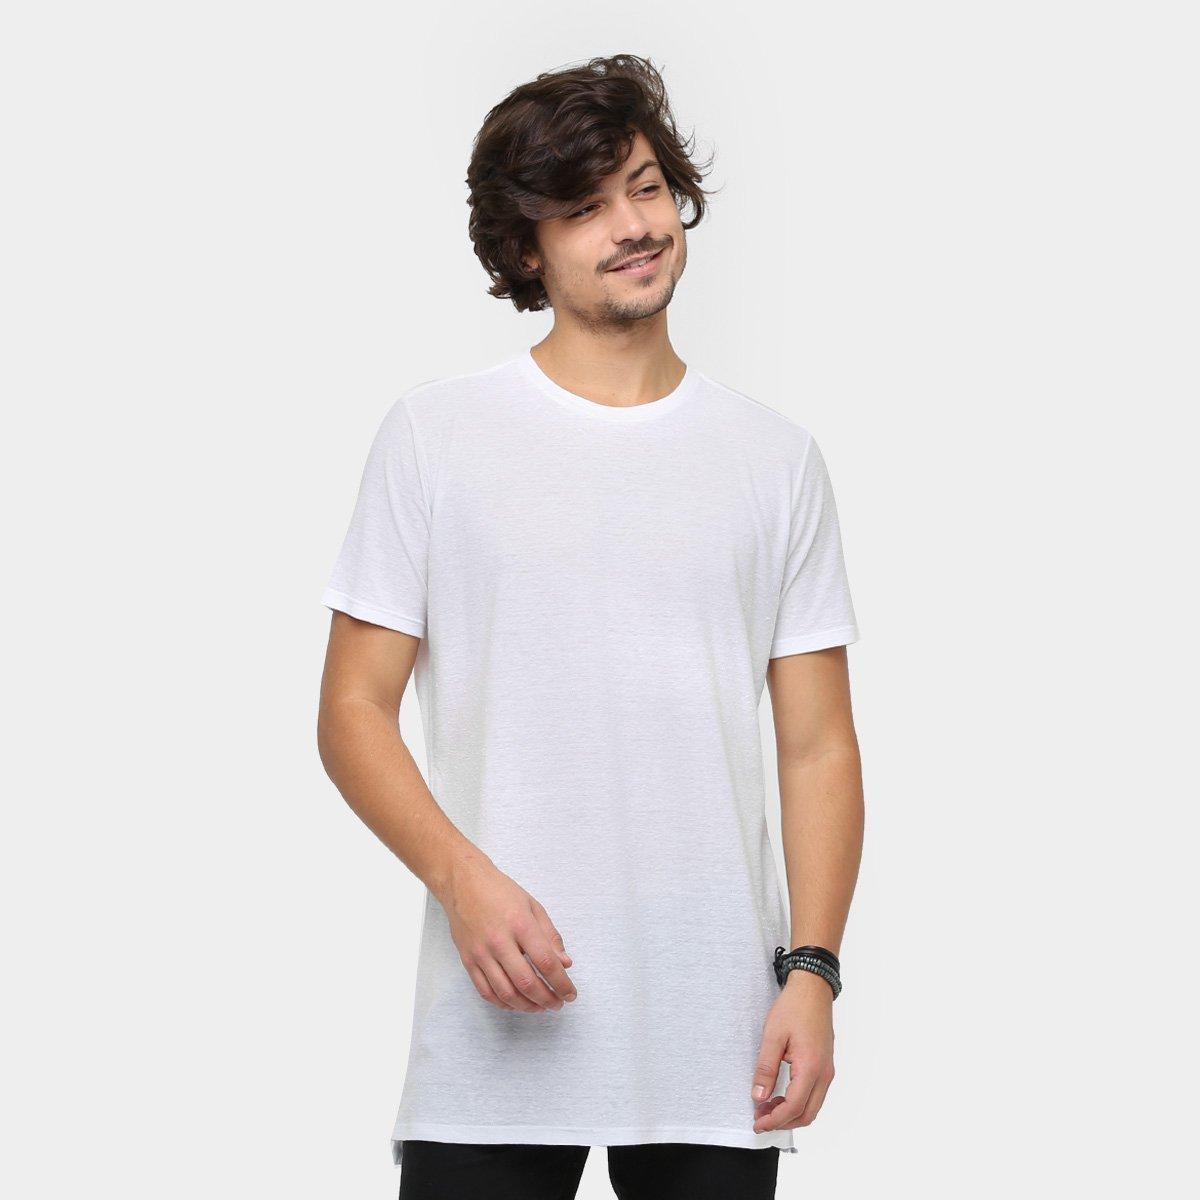 Camiseta Ellus Long Flame Masculina - Compre Agora  6107a504ad1